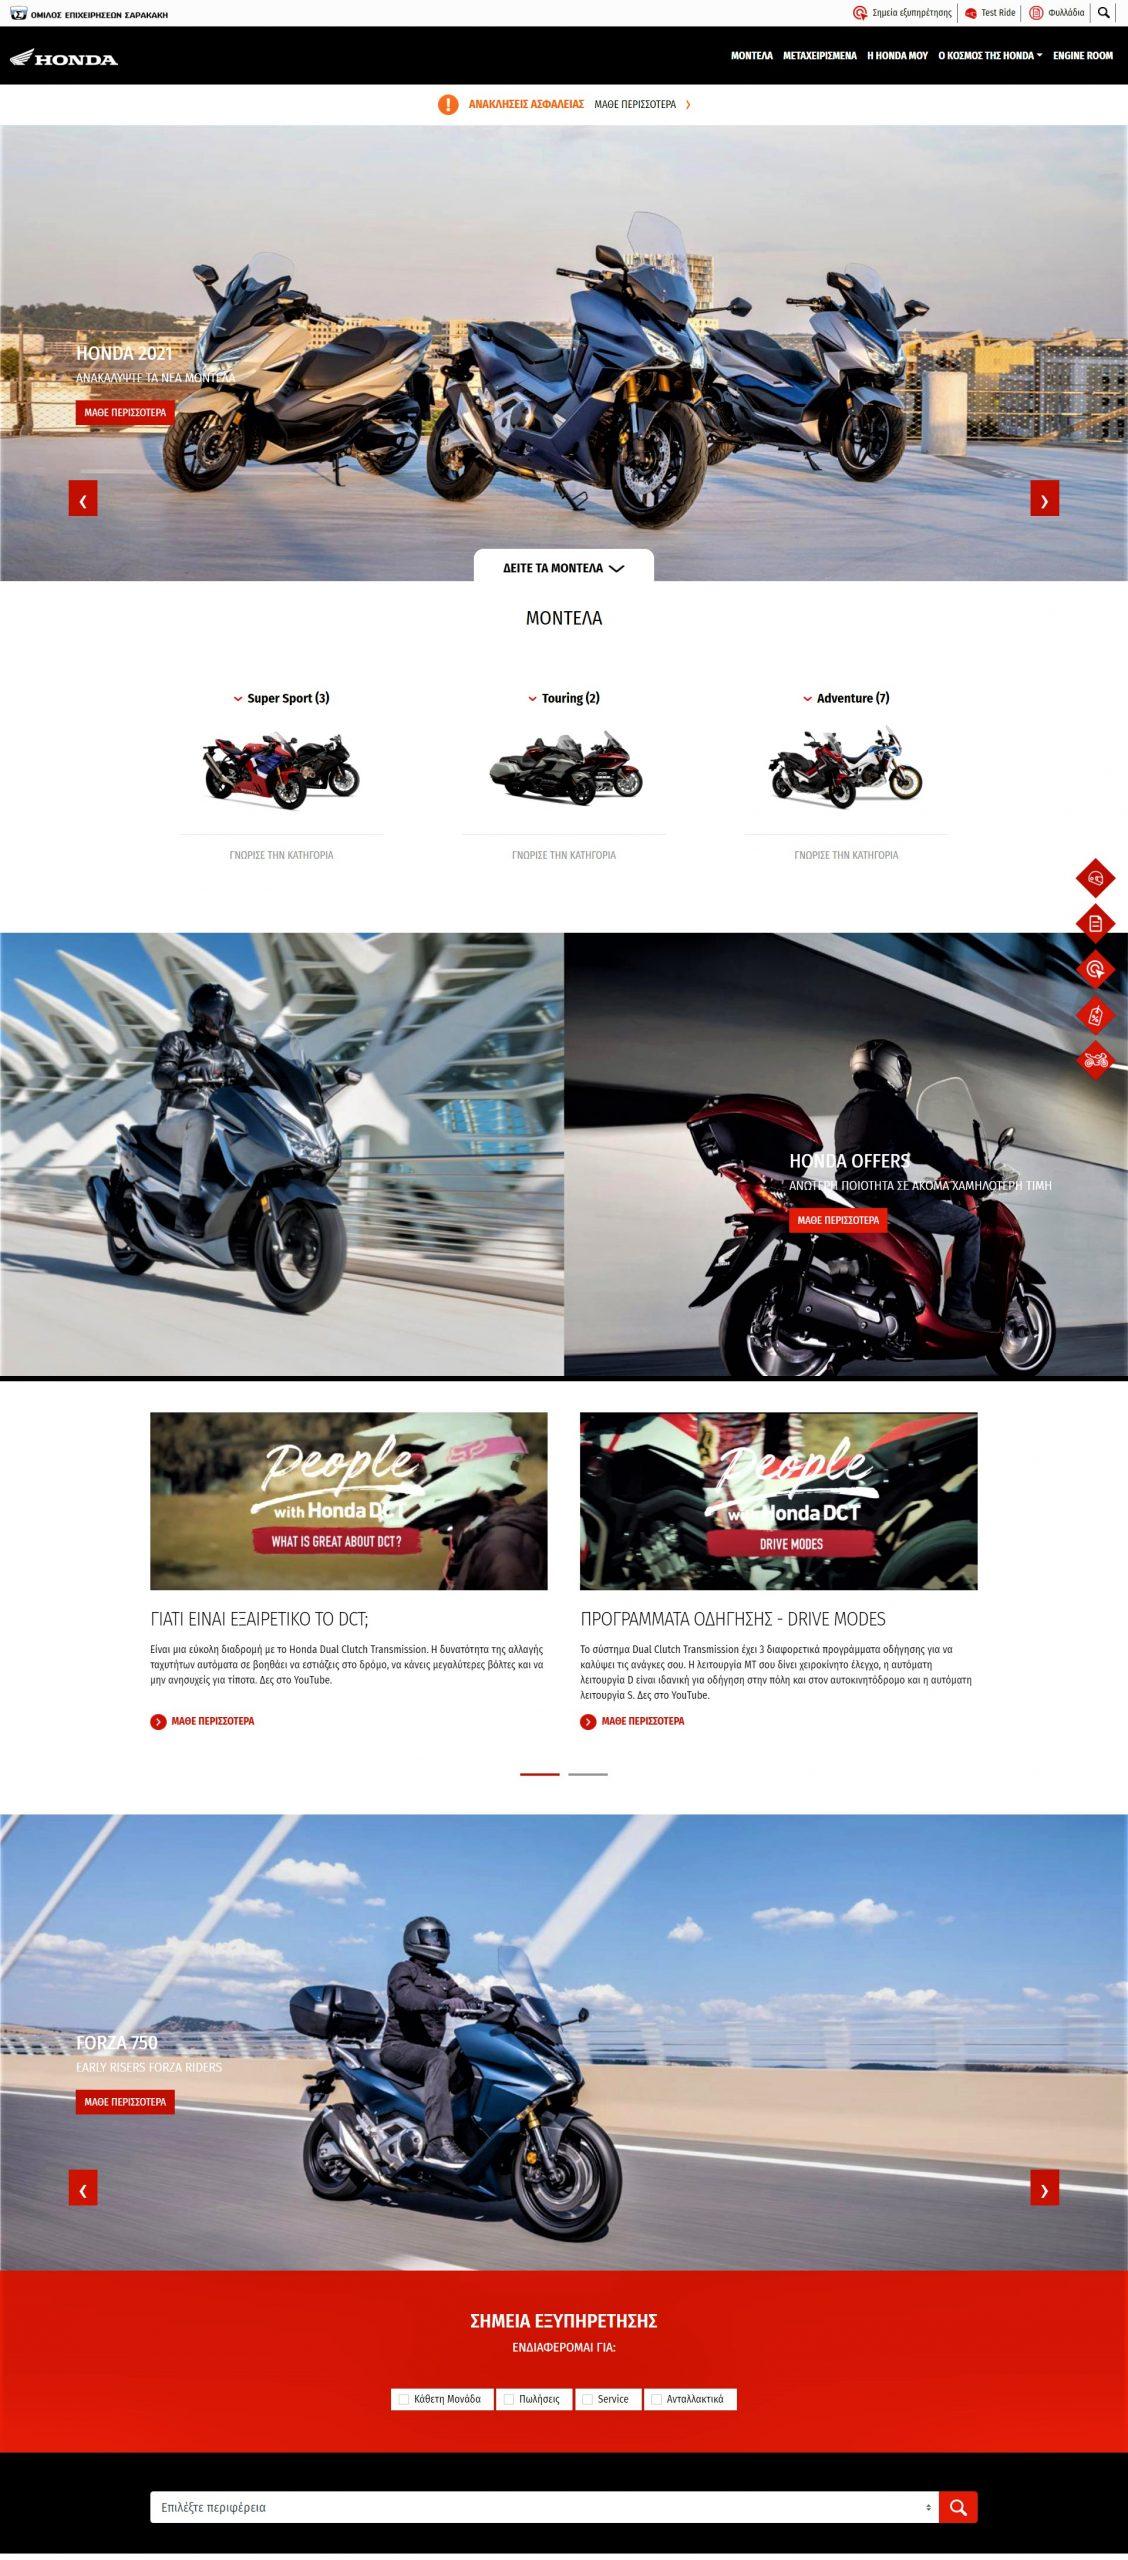 MOTORS screencapture honda motorcycles gr 2021 06 22 14 54 09 scaled Είδατε το Νέο Website της Honda; Honda, ειδήσεις, Νέα